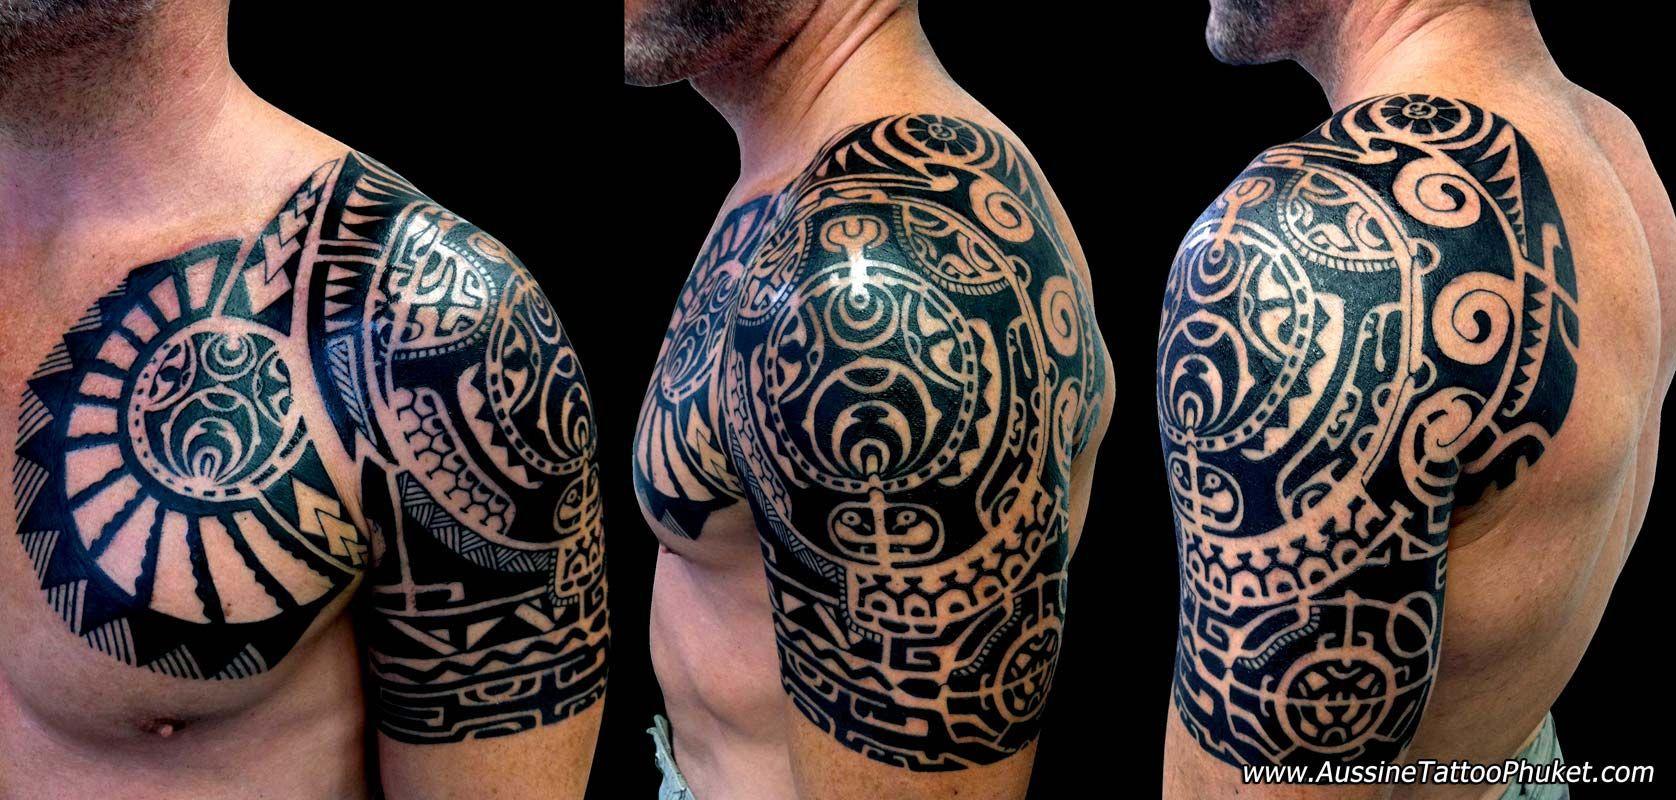 Modern Tattoo Designs Men - Google Search